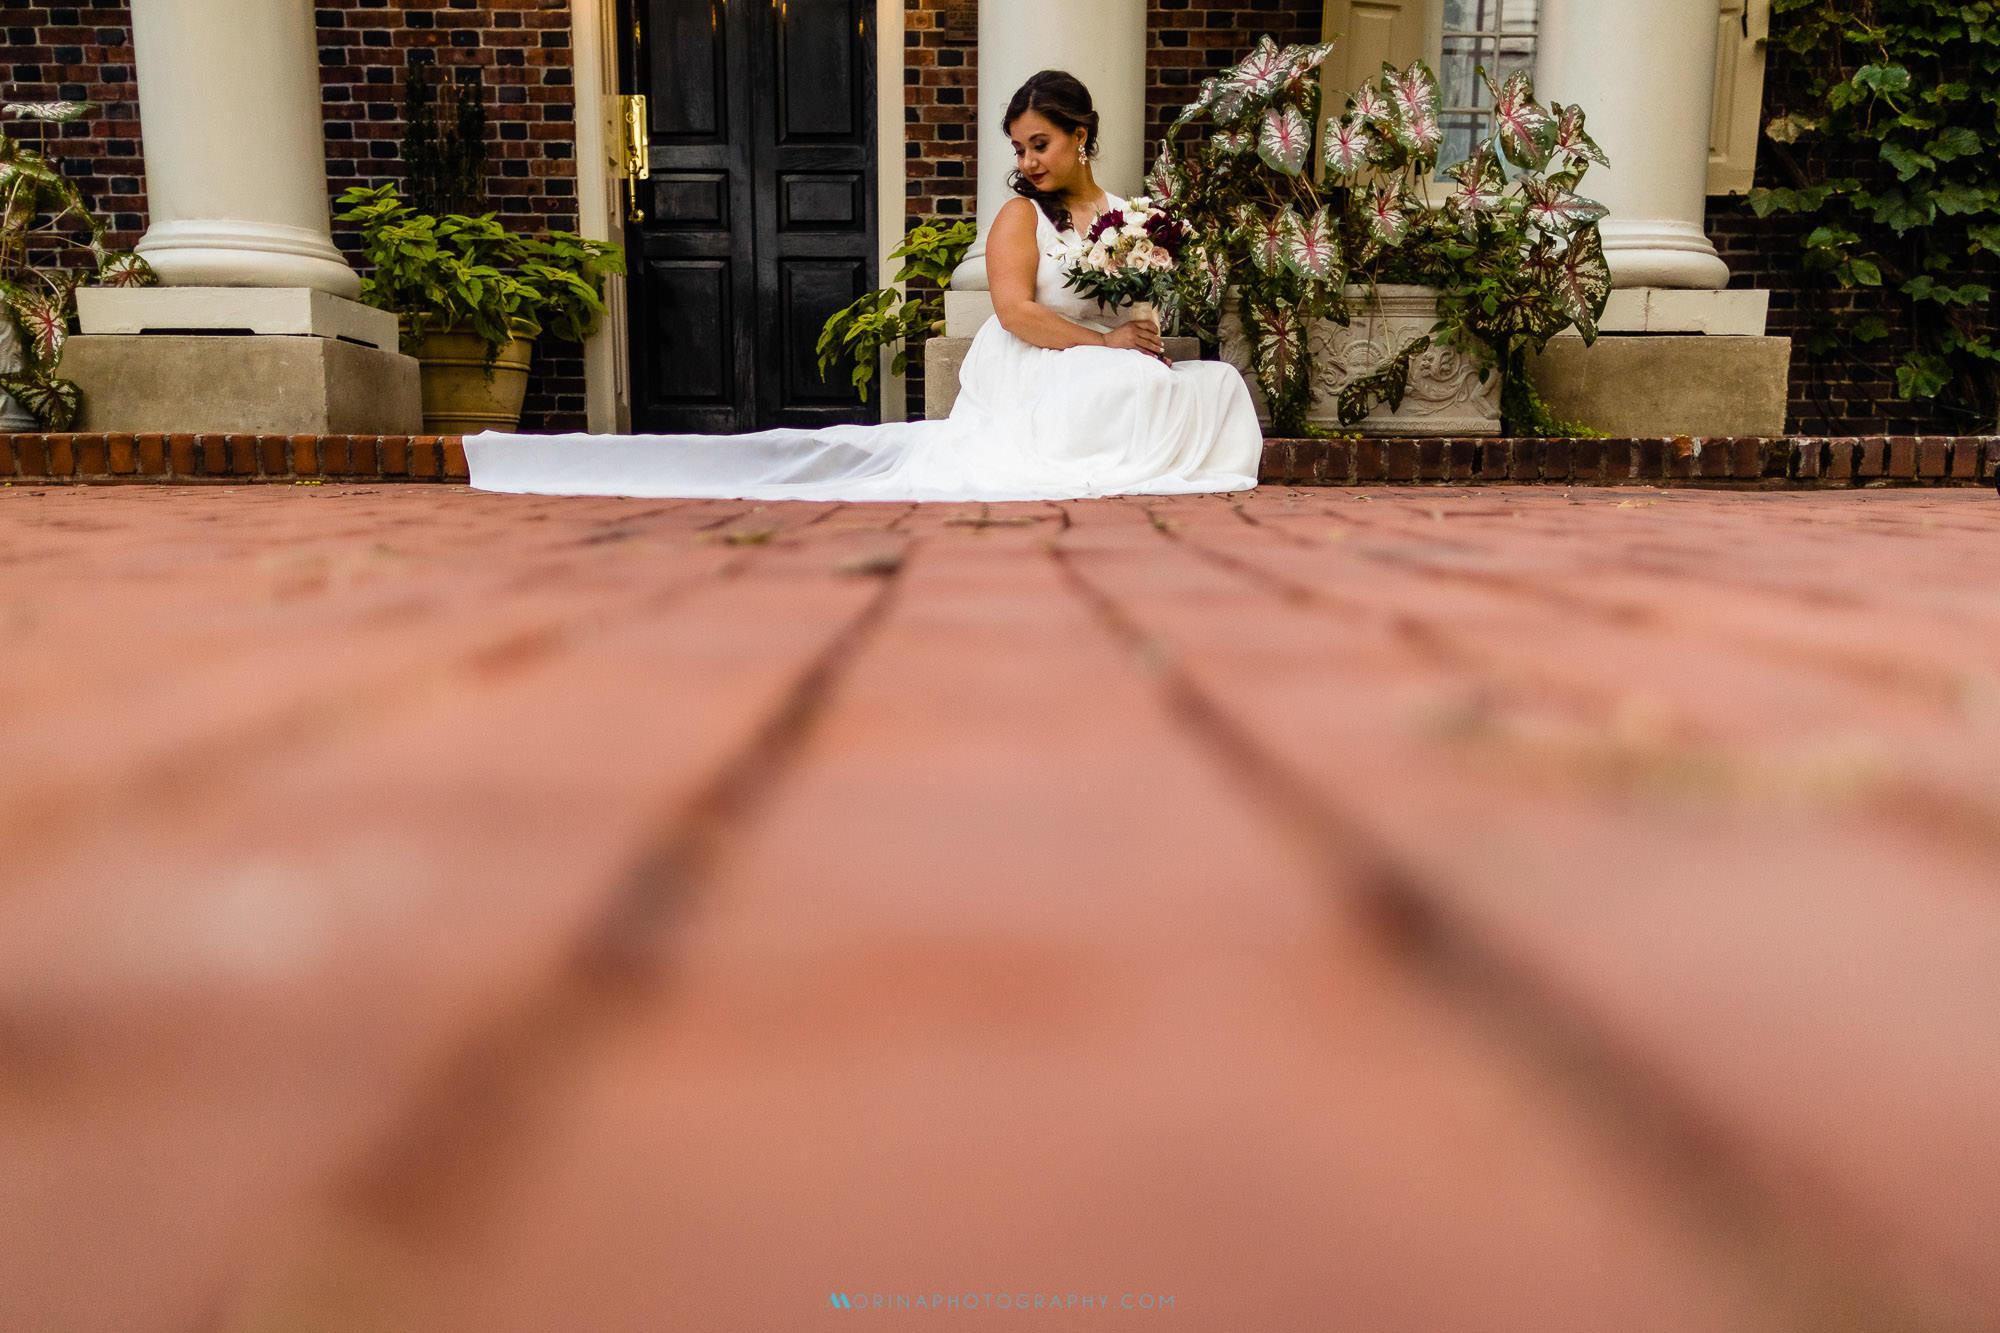 Yuki & Michael Wedding at Morris House Hotel Blog 0059.jpg